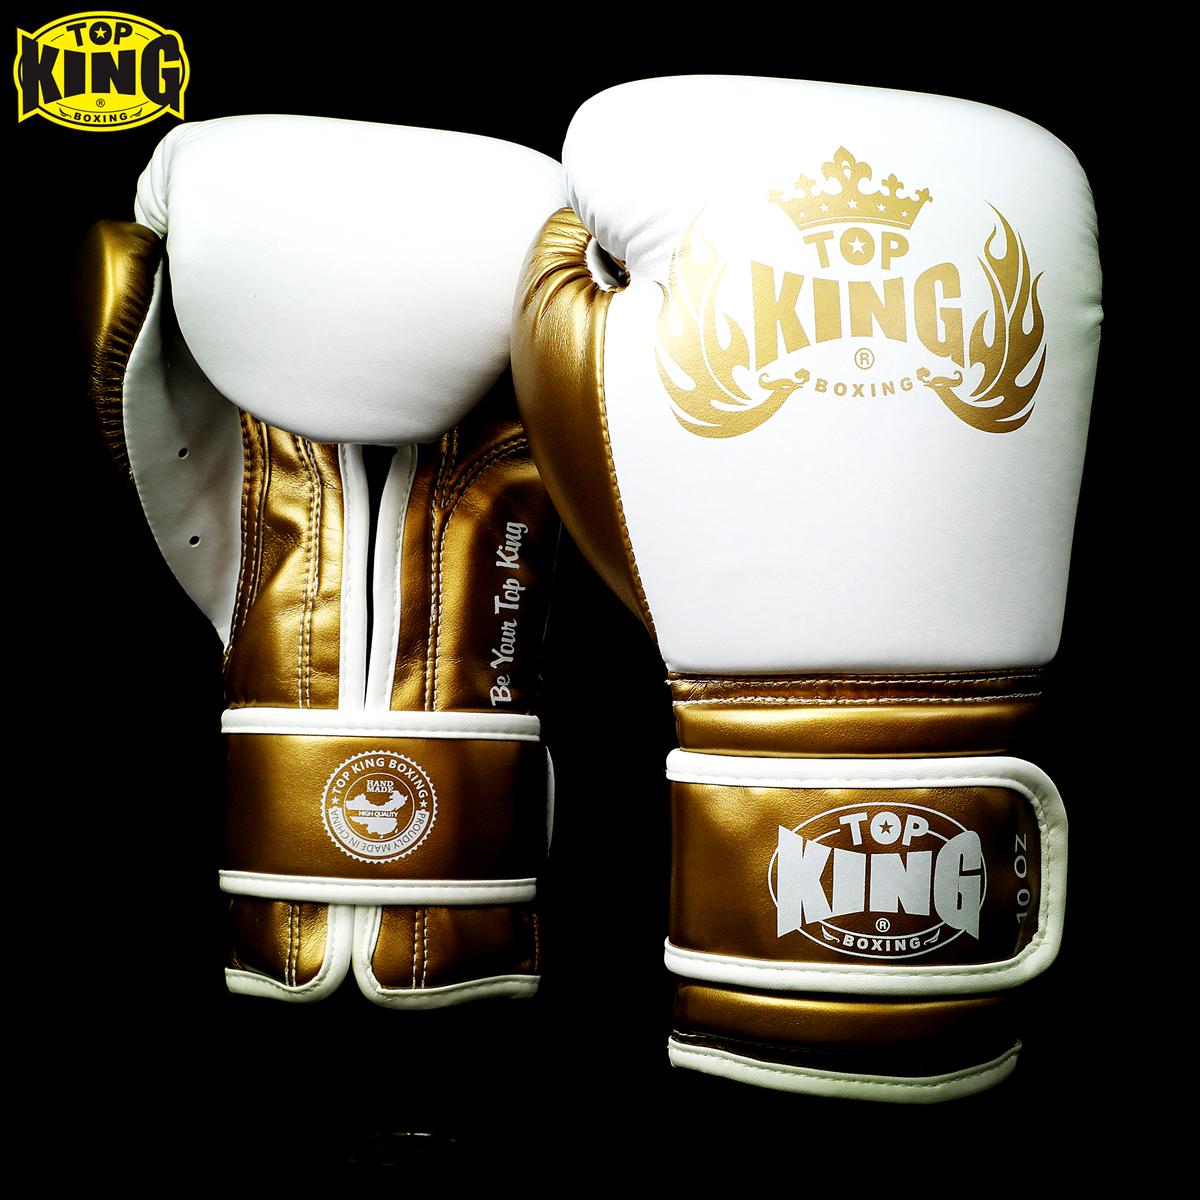 Topking boxing gloves top King boxing boxing boxing